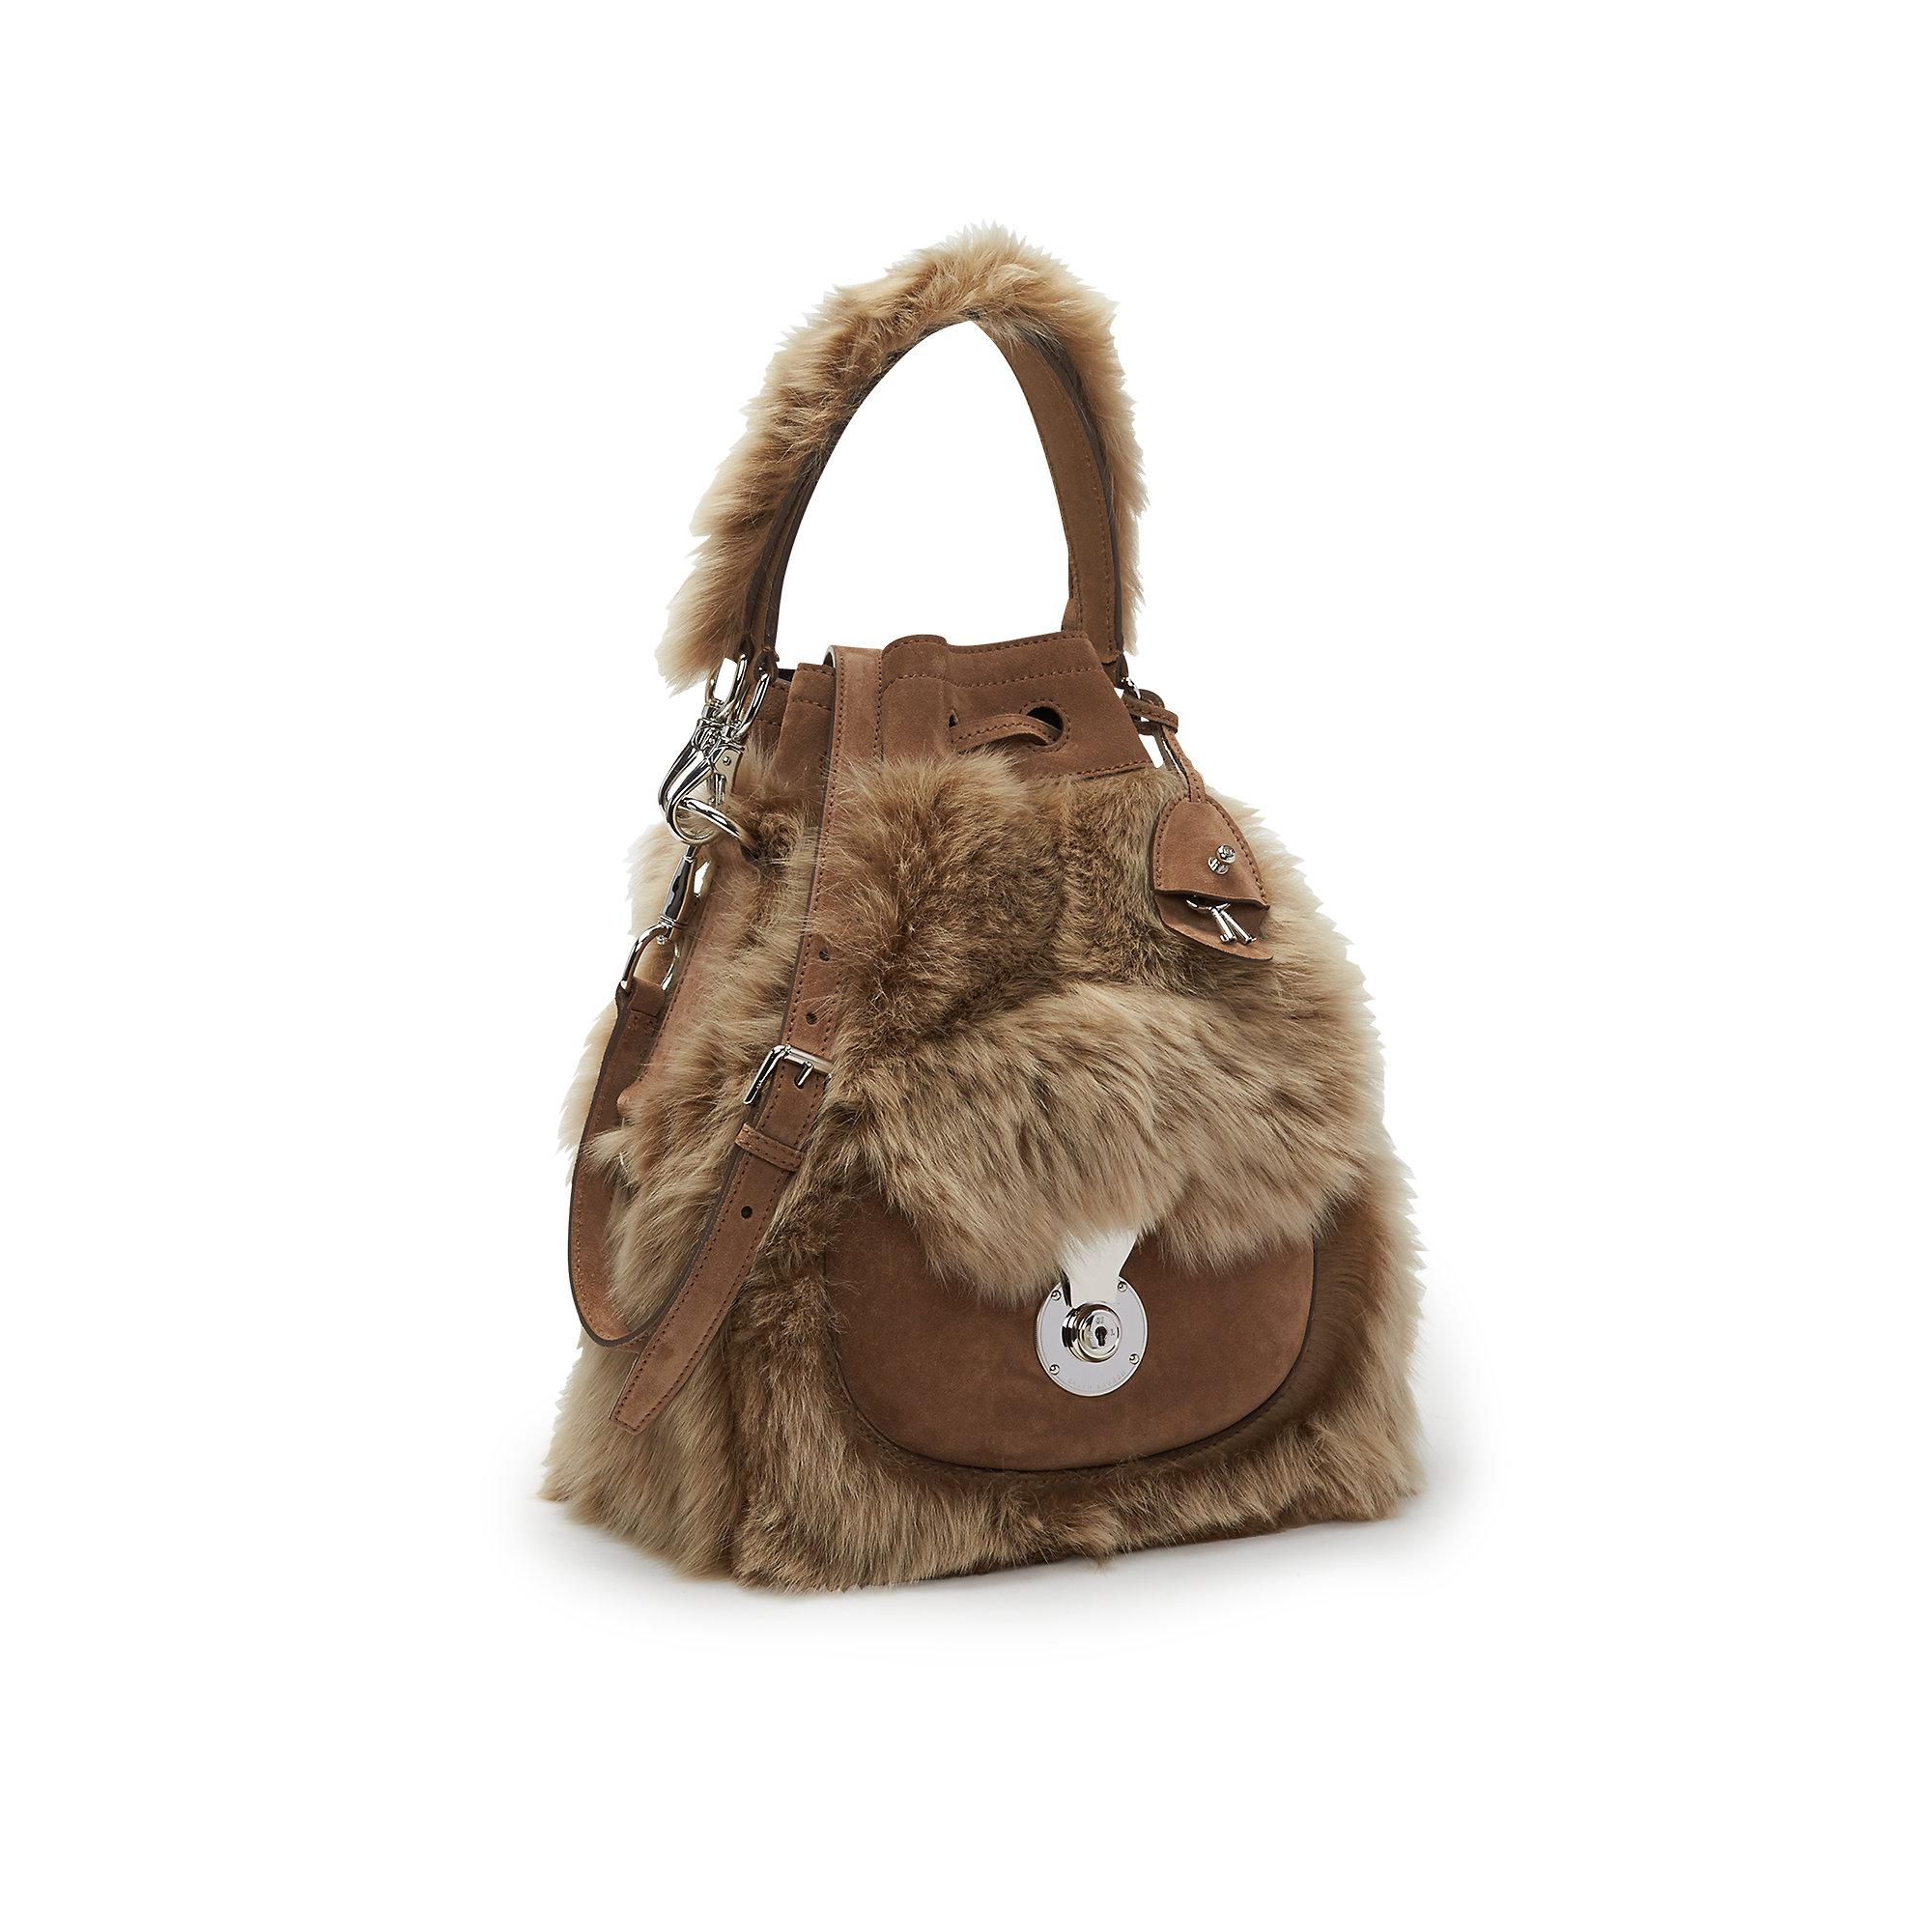 353c73ac19ba Lyst - Ralph Lauren Shearling Ricky Drawstring Bag in Natural